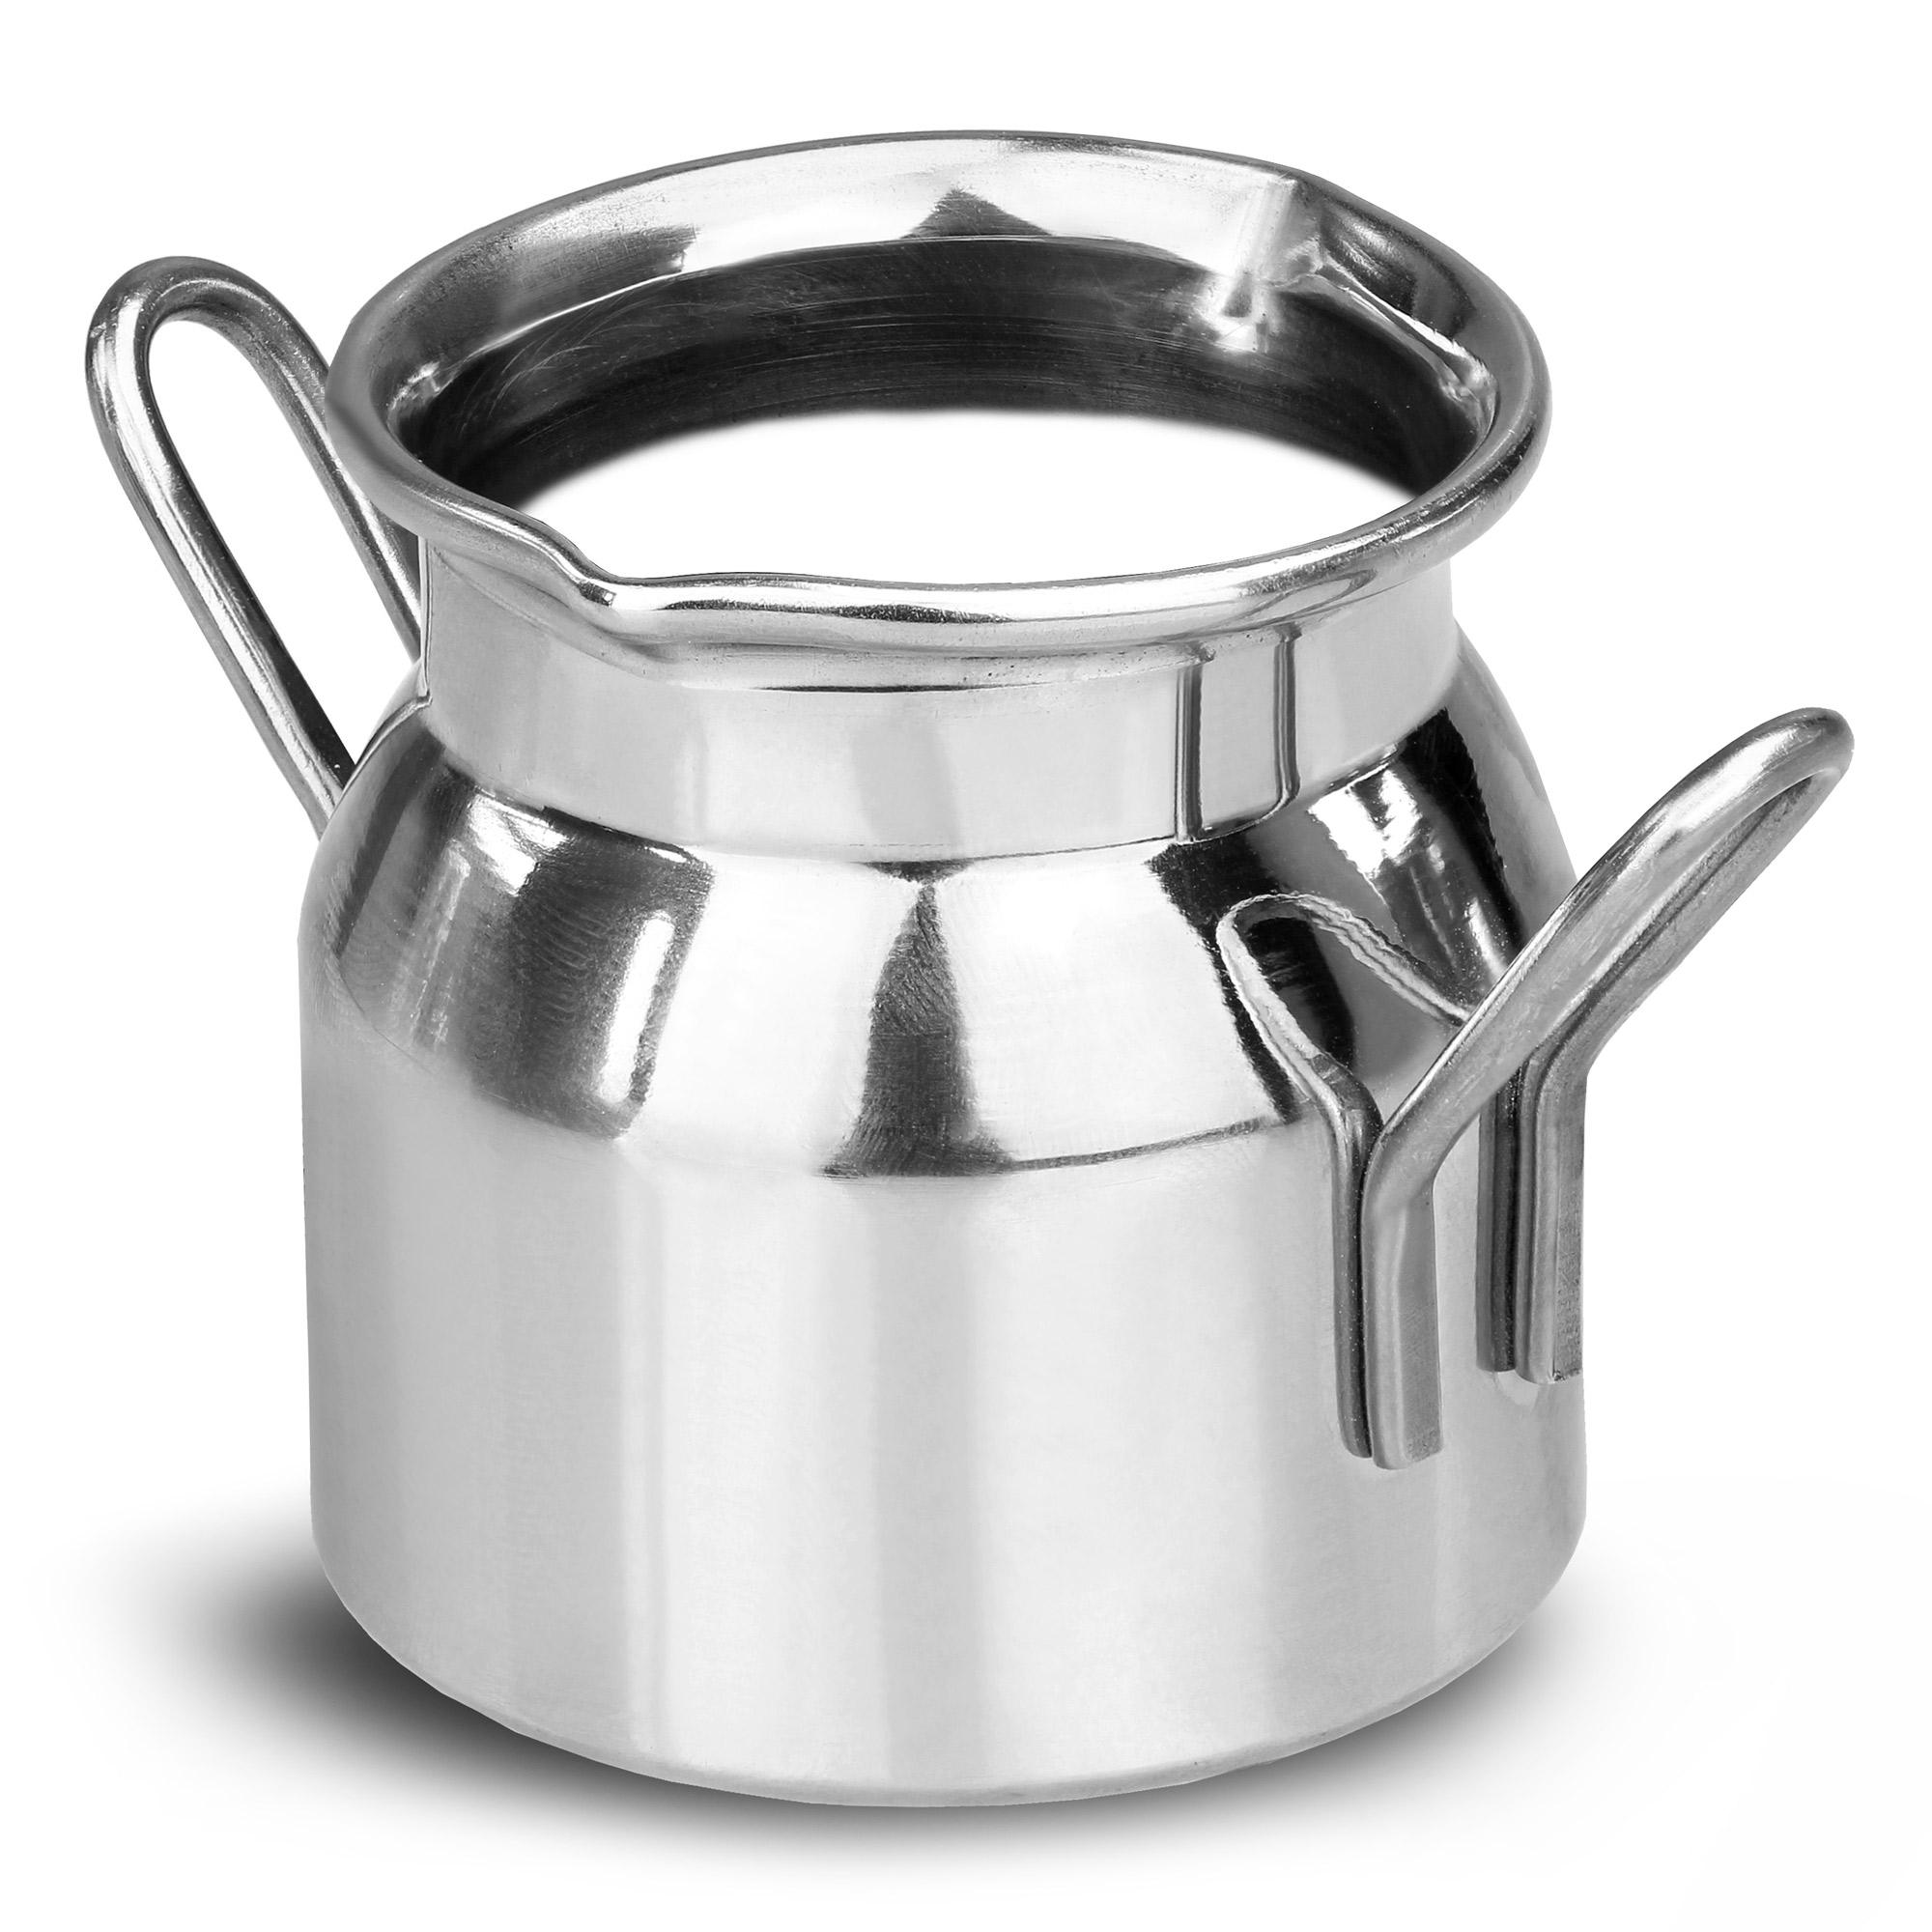 stainless steel mini milk churn 70ml set of 6 novelty. Black Bedroom Furniture Sets. Home Design Ideas